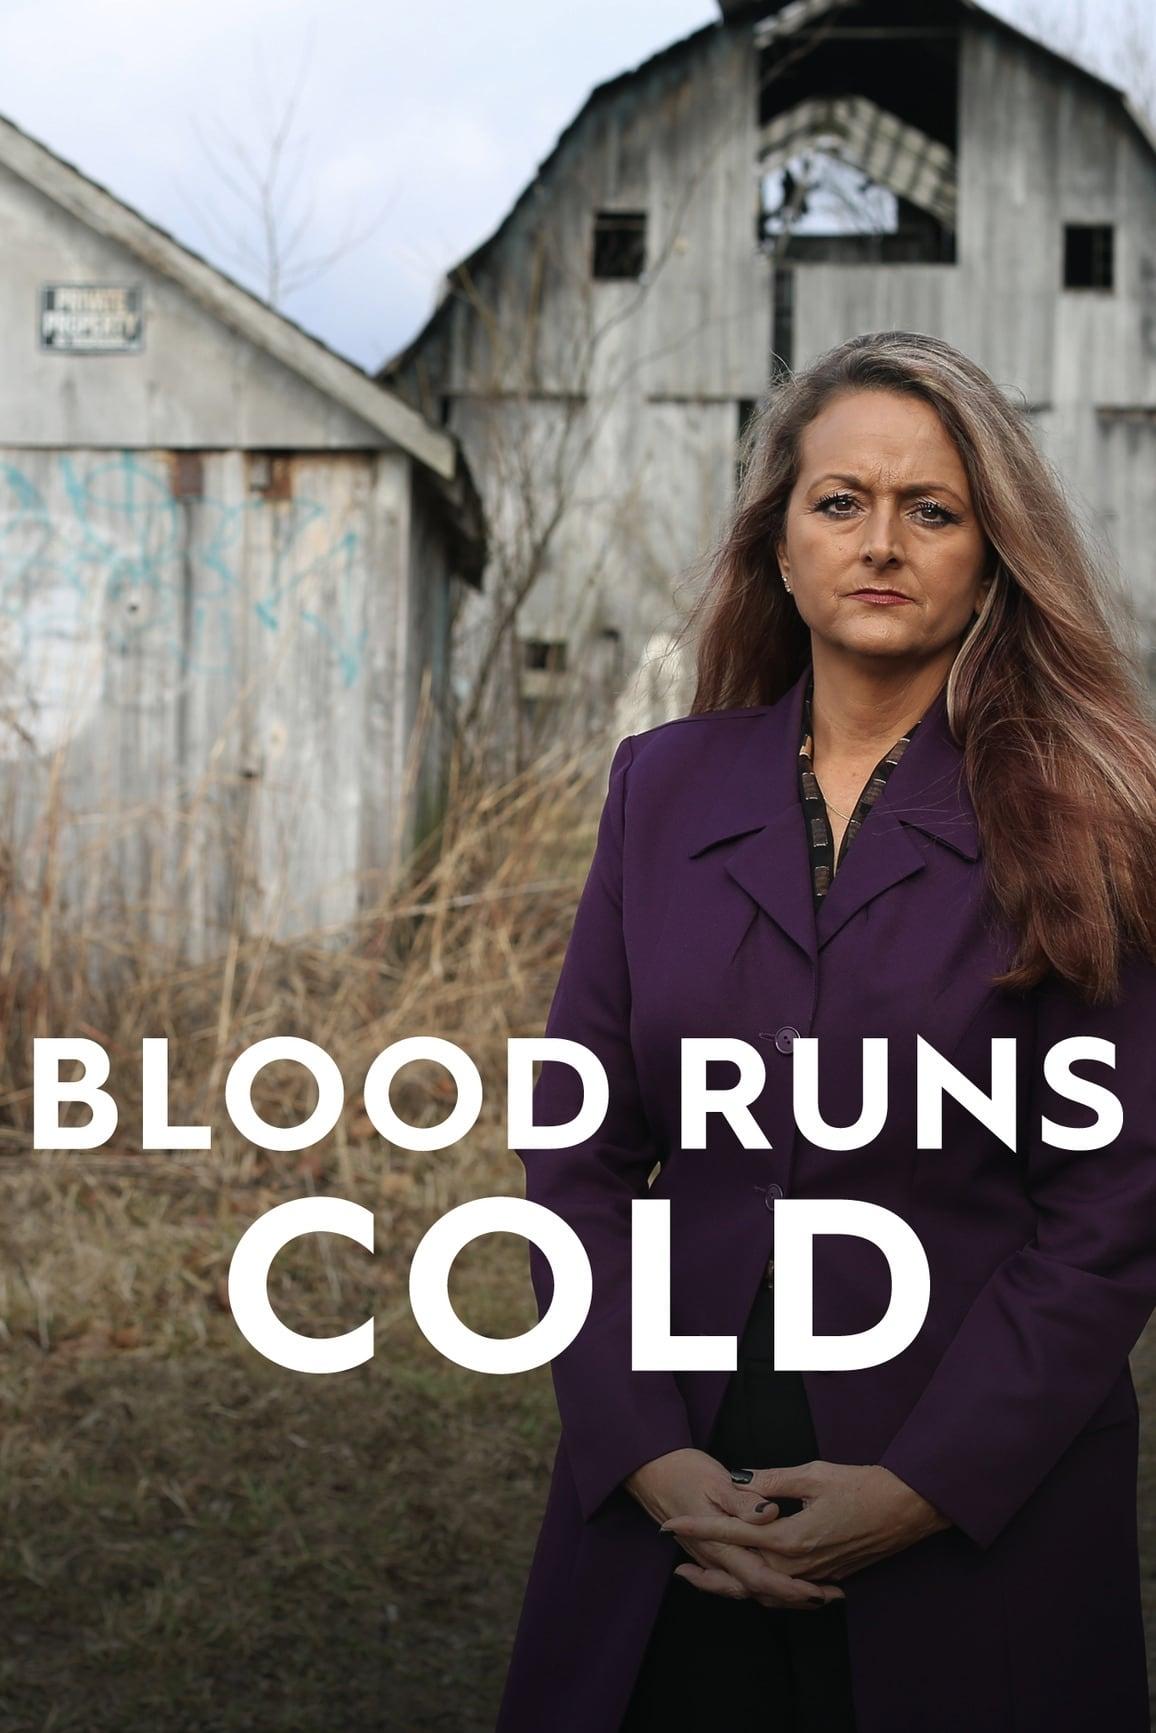 Blood Runs Cold (2018)